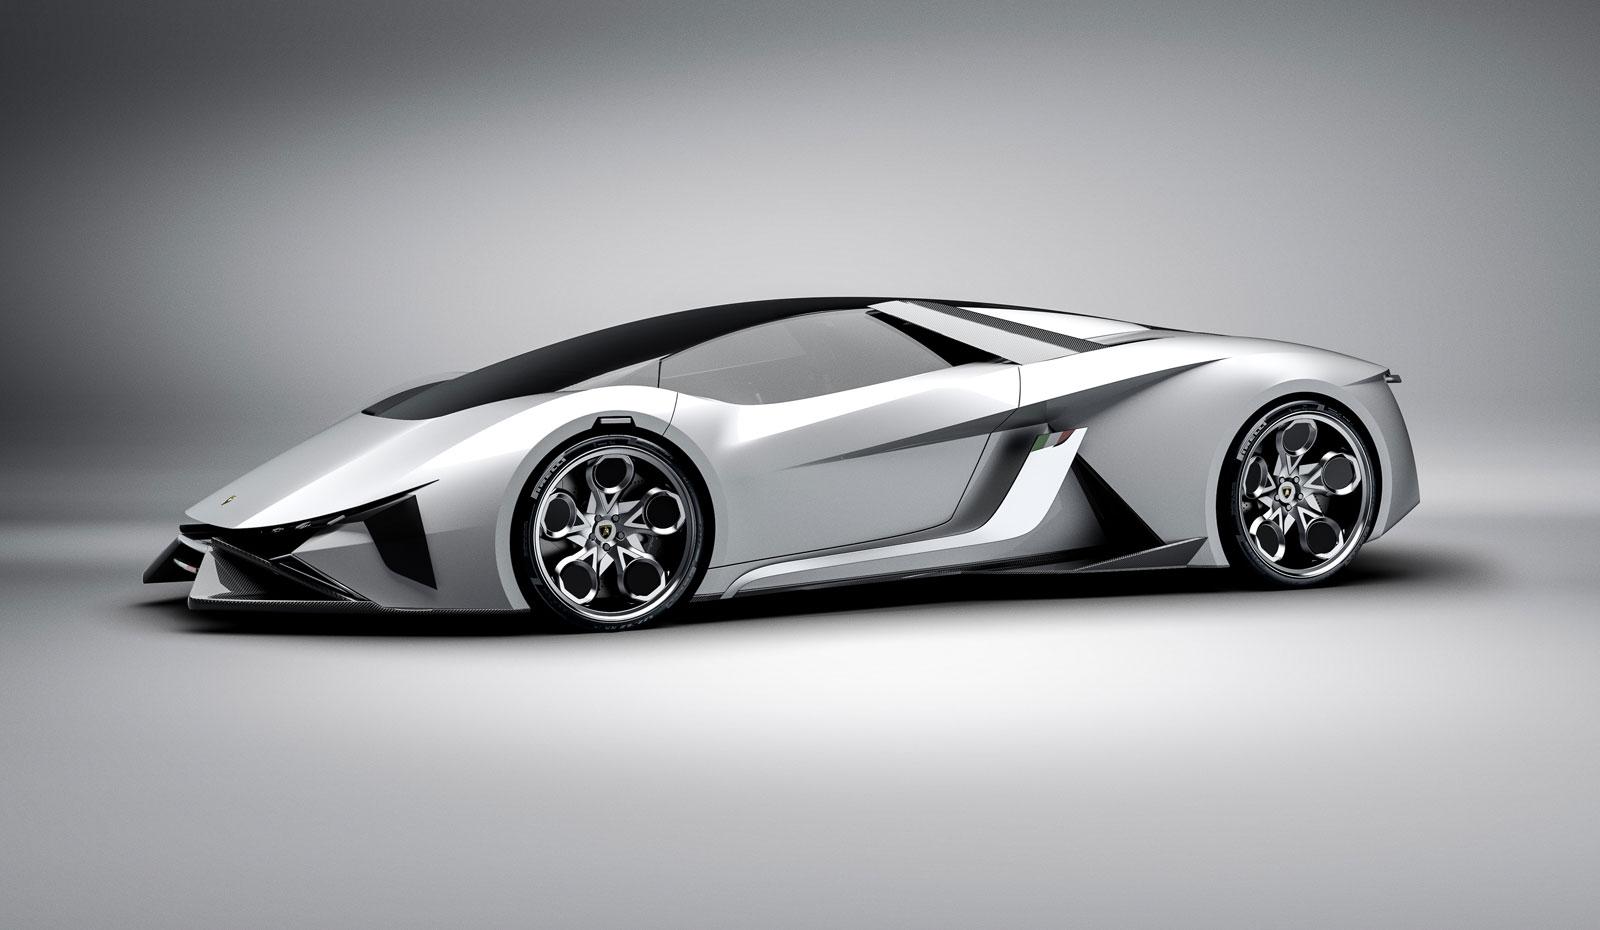 Lamborghini Diamante Concept Car Body Design 2001 Fuse Box Diagram